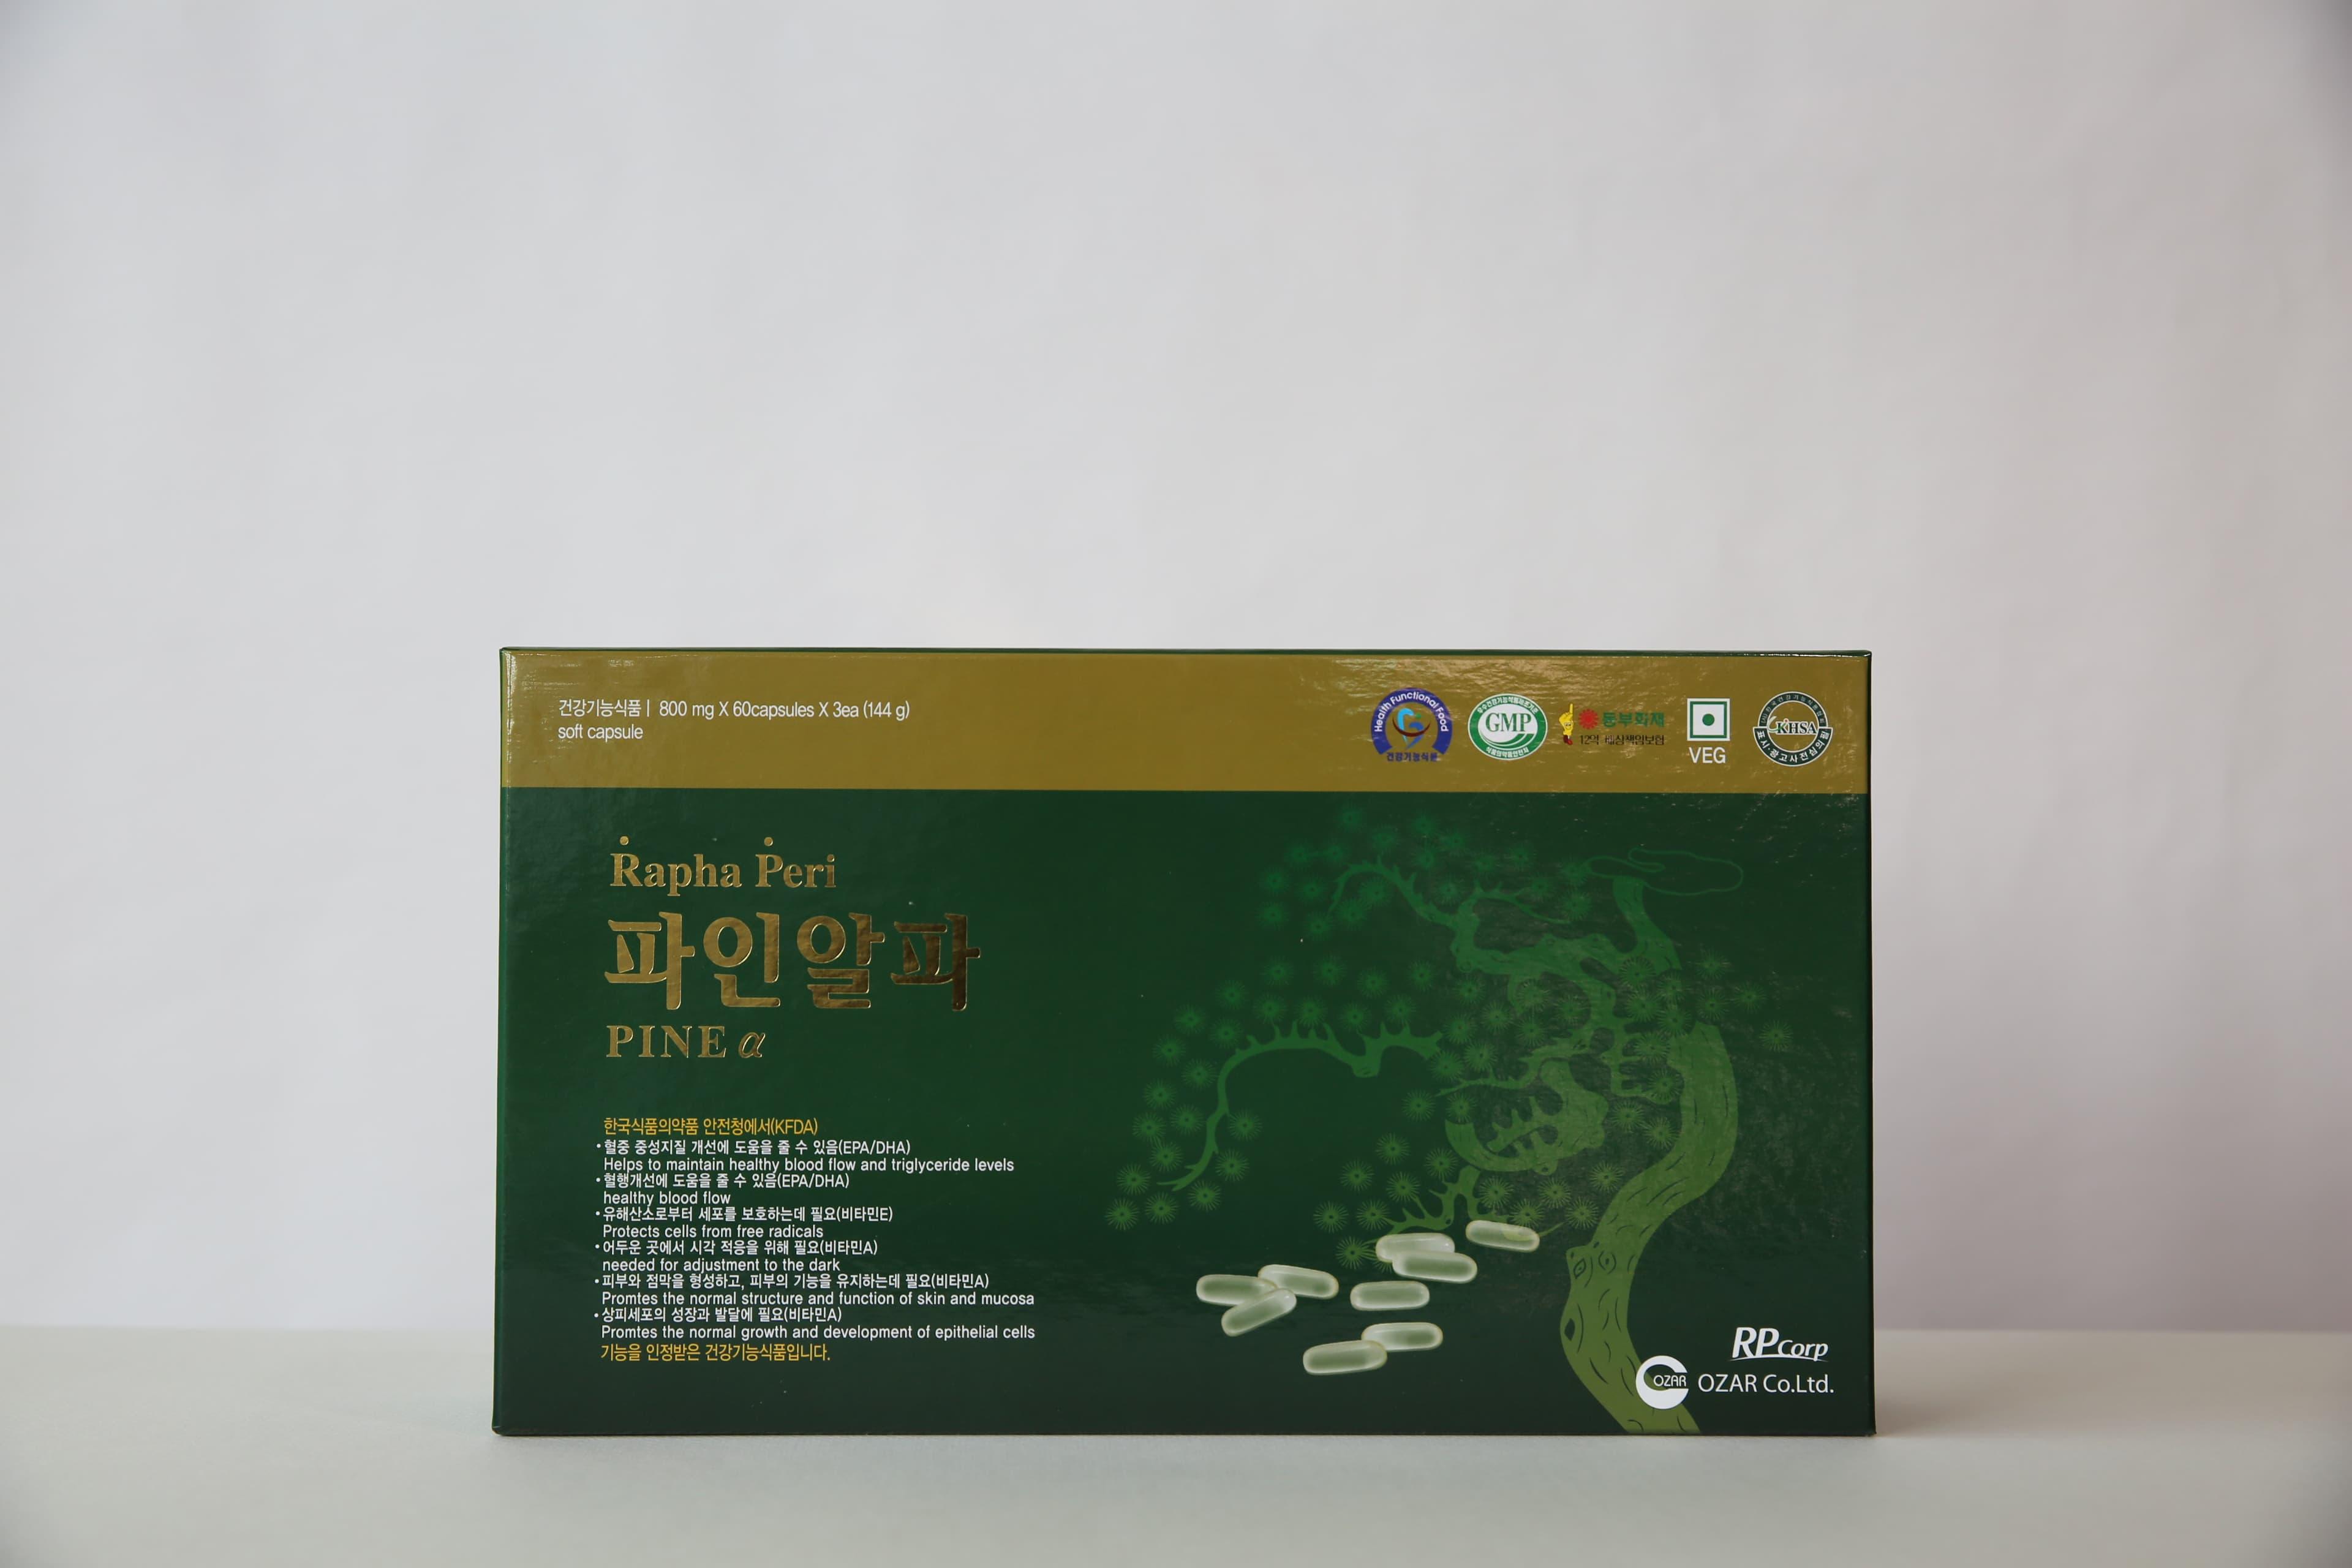 Food_health_diet_cosmetic_beautiful_pine